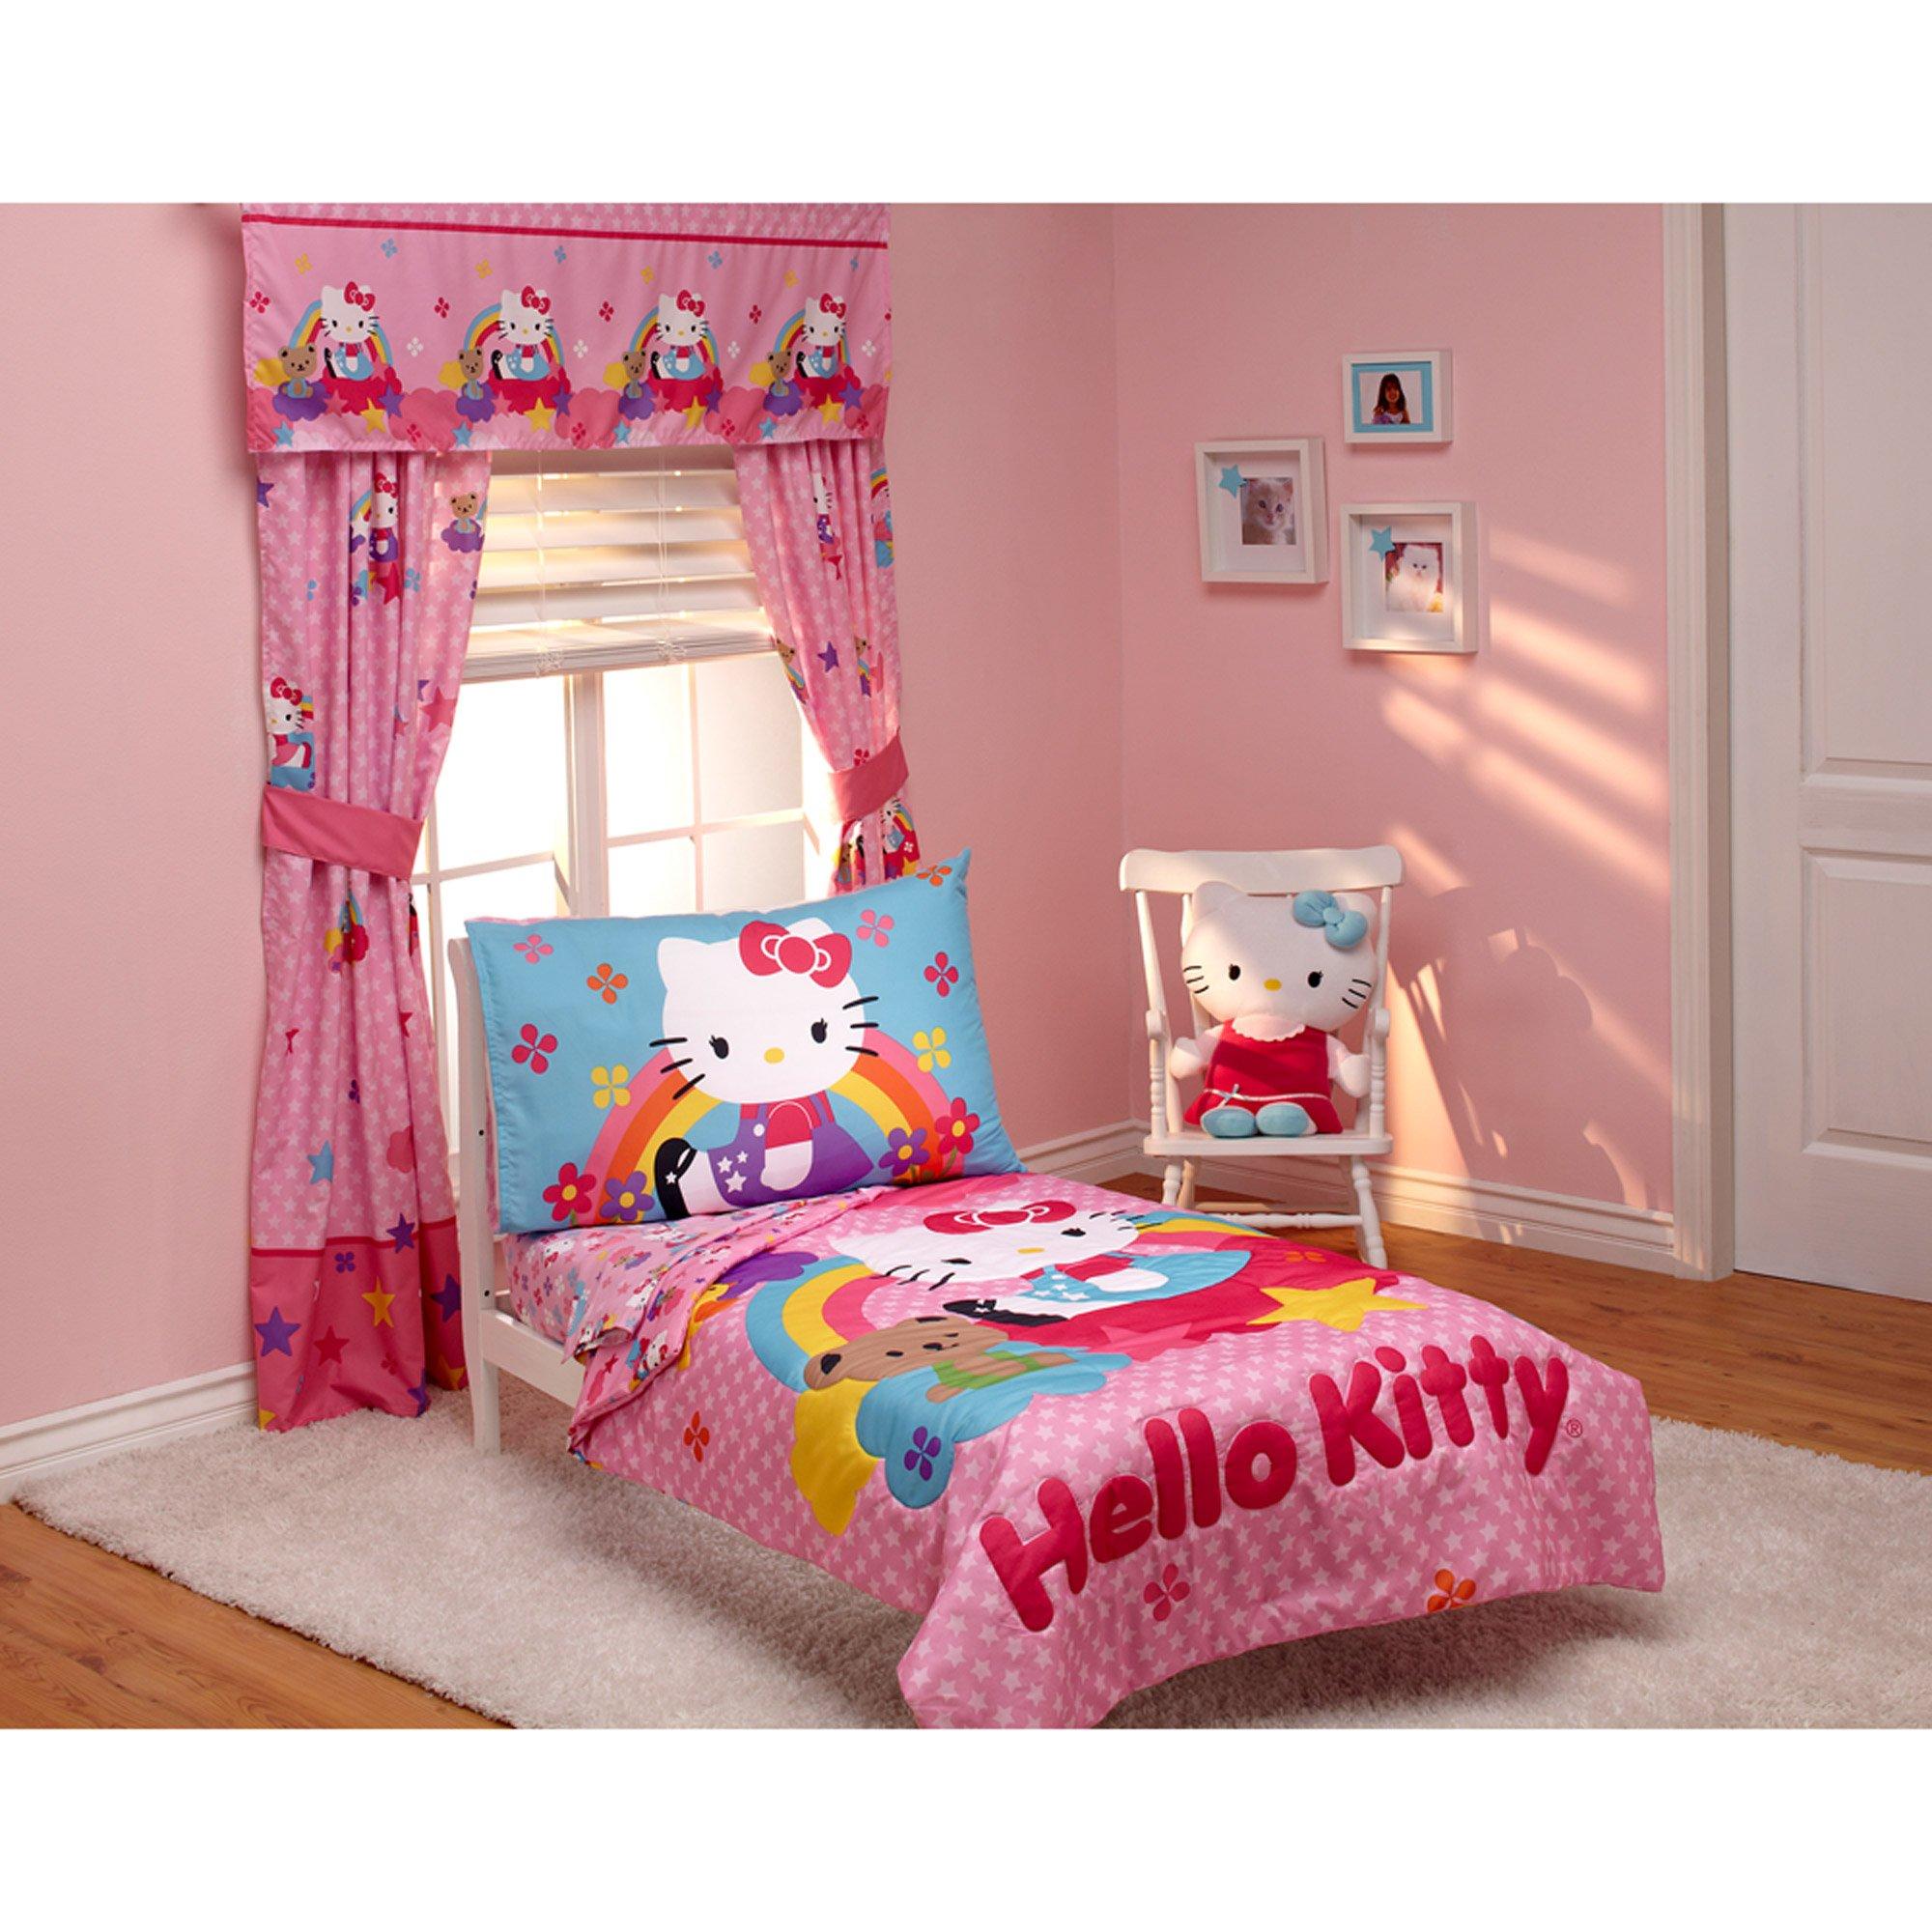 Hello Kitty Stars and Rainbows 4-piece Toddler Bedding Set